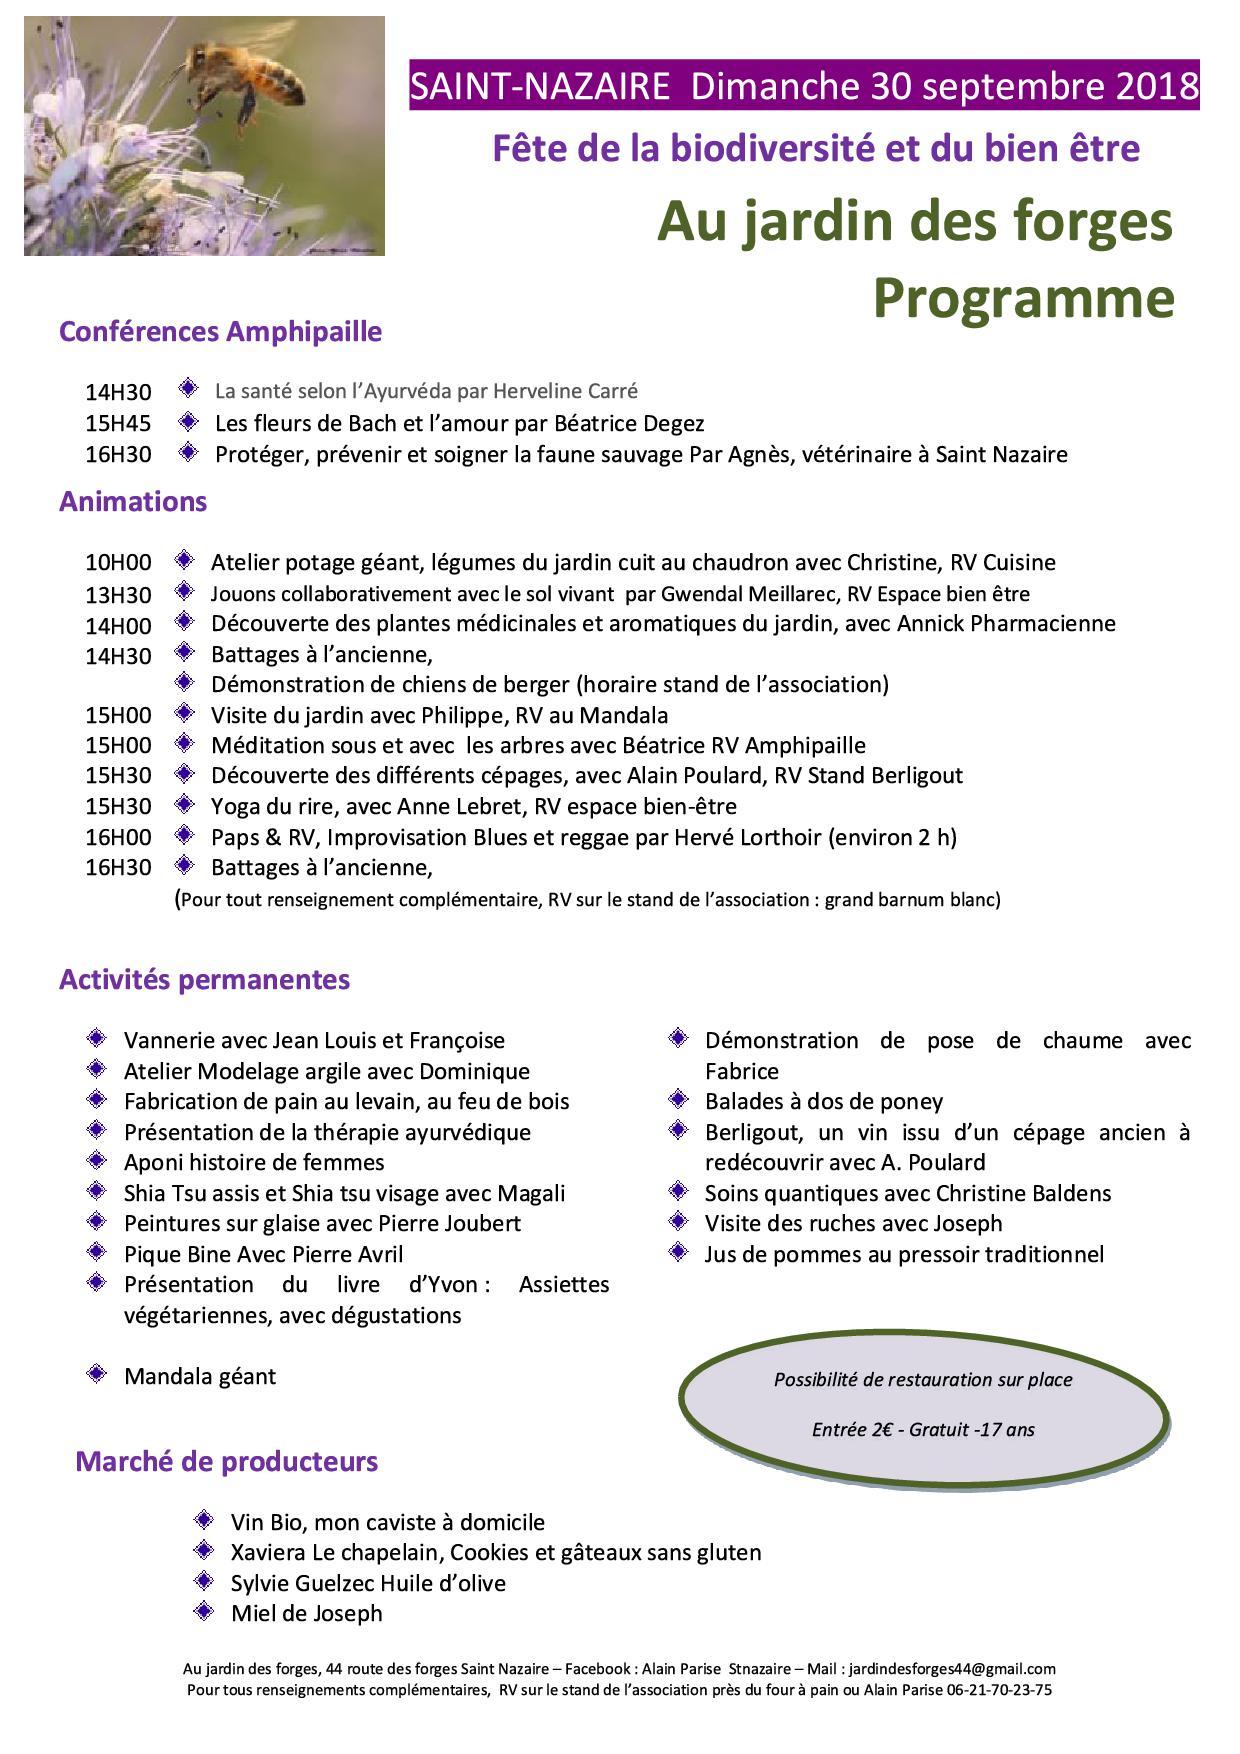 Programme fete 30 septembre 2018 v 1